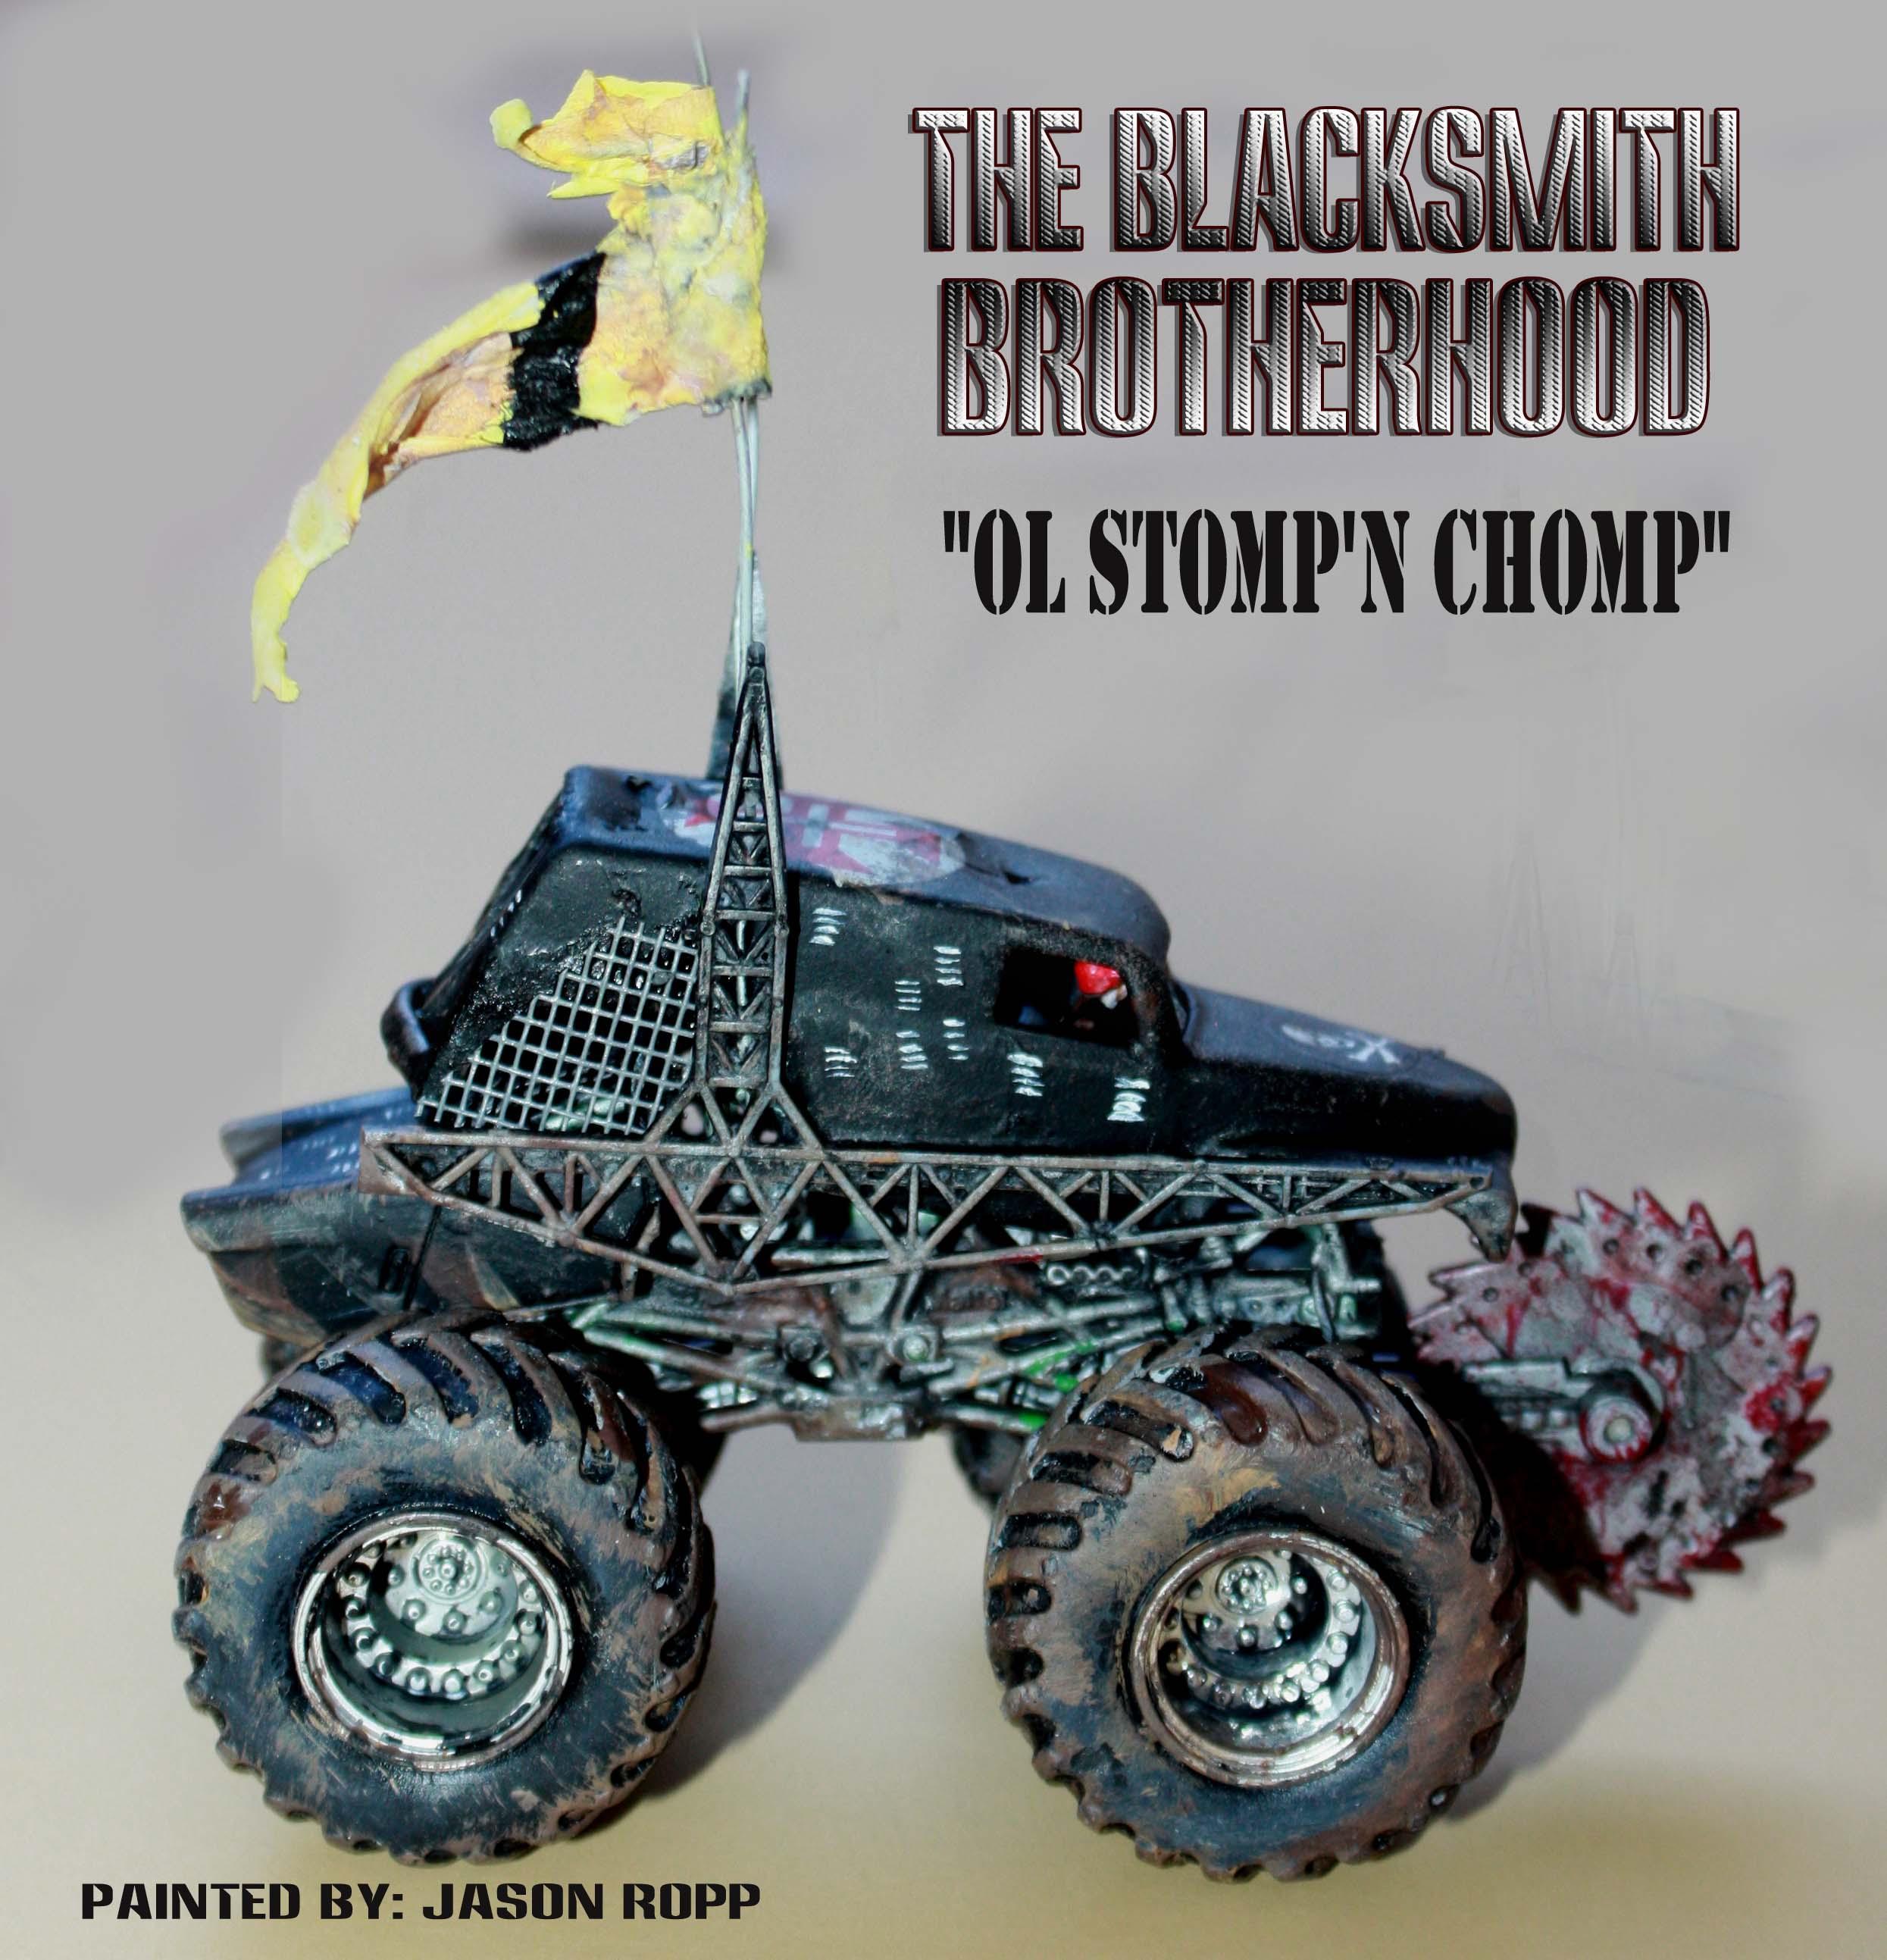 666, Battle Cars, Blacksmith, Brotherhood, Cars, Chomp, Combat, Conversion, Dark Future, Devil's Run, Devil's Run 666, Fury, Fury Road, Game, Gamer, Hot Wheels, Mad Max, Matchbox, Miniatures, Monster Trucks, Post Appacoliptic, Road, Stomp, Thunderdome, Trucks, Vehicle, War, Wargame, Wargamer